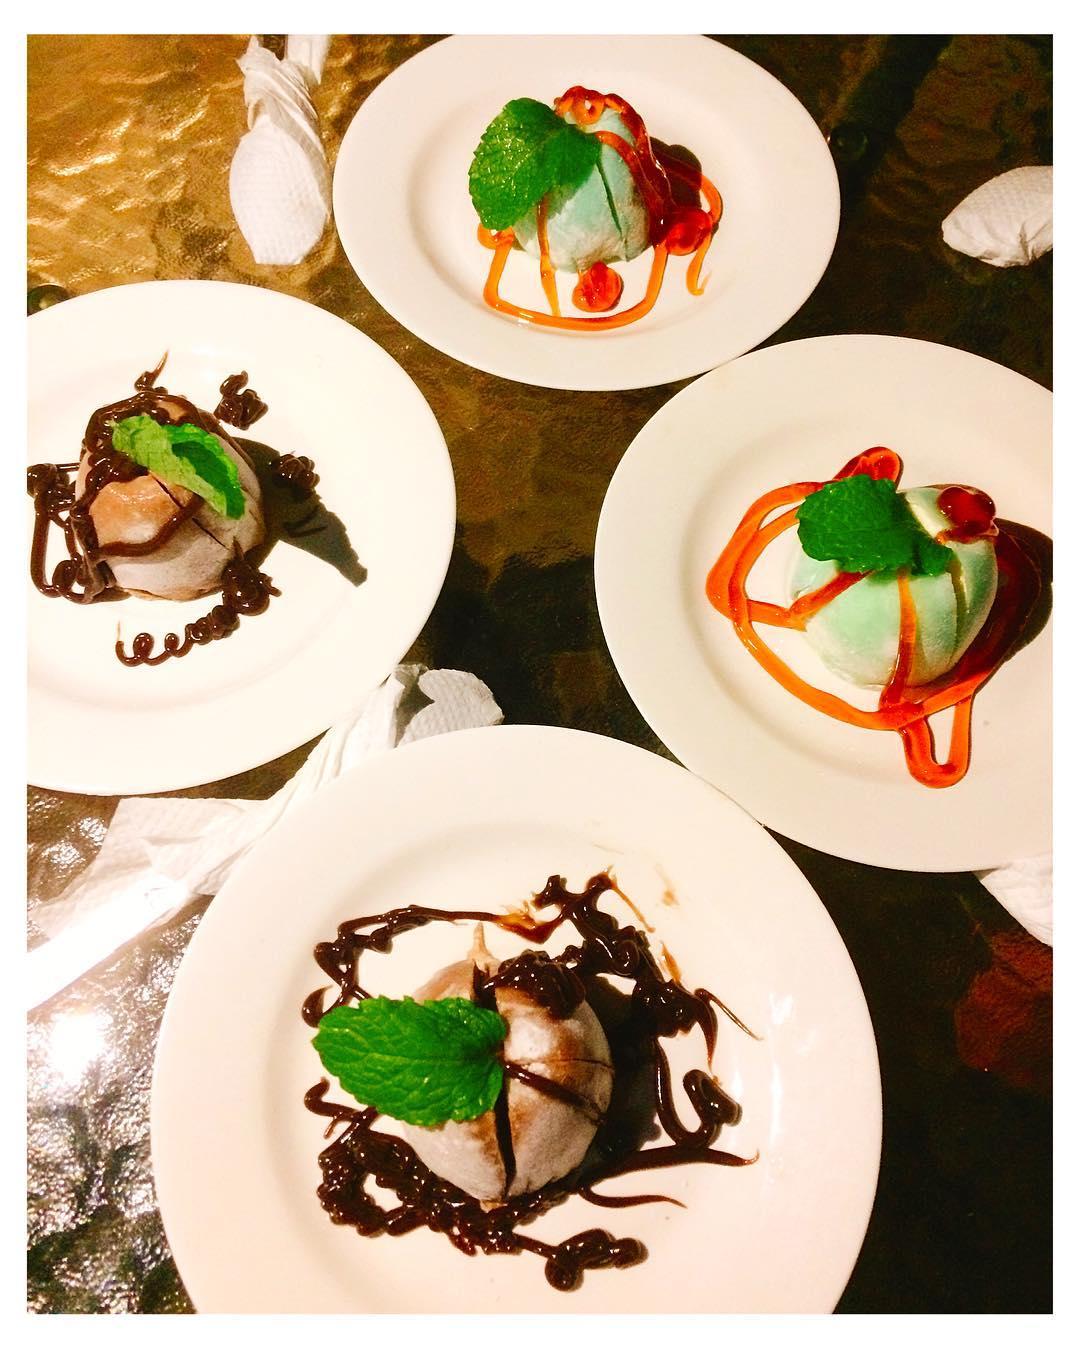 Mochi Ice Cream, Mochi Ice Cream Bandung, Kota Bandung, Bandung, Dolan Dolen, Dolaners Mochi Ice Cream via suzana - Dolan Dolen